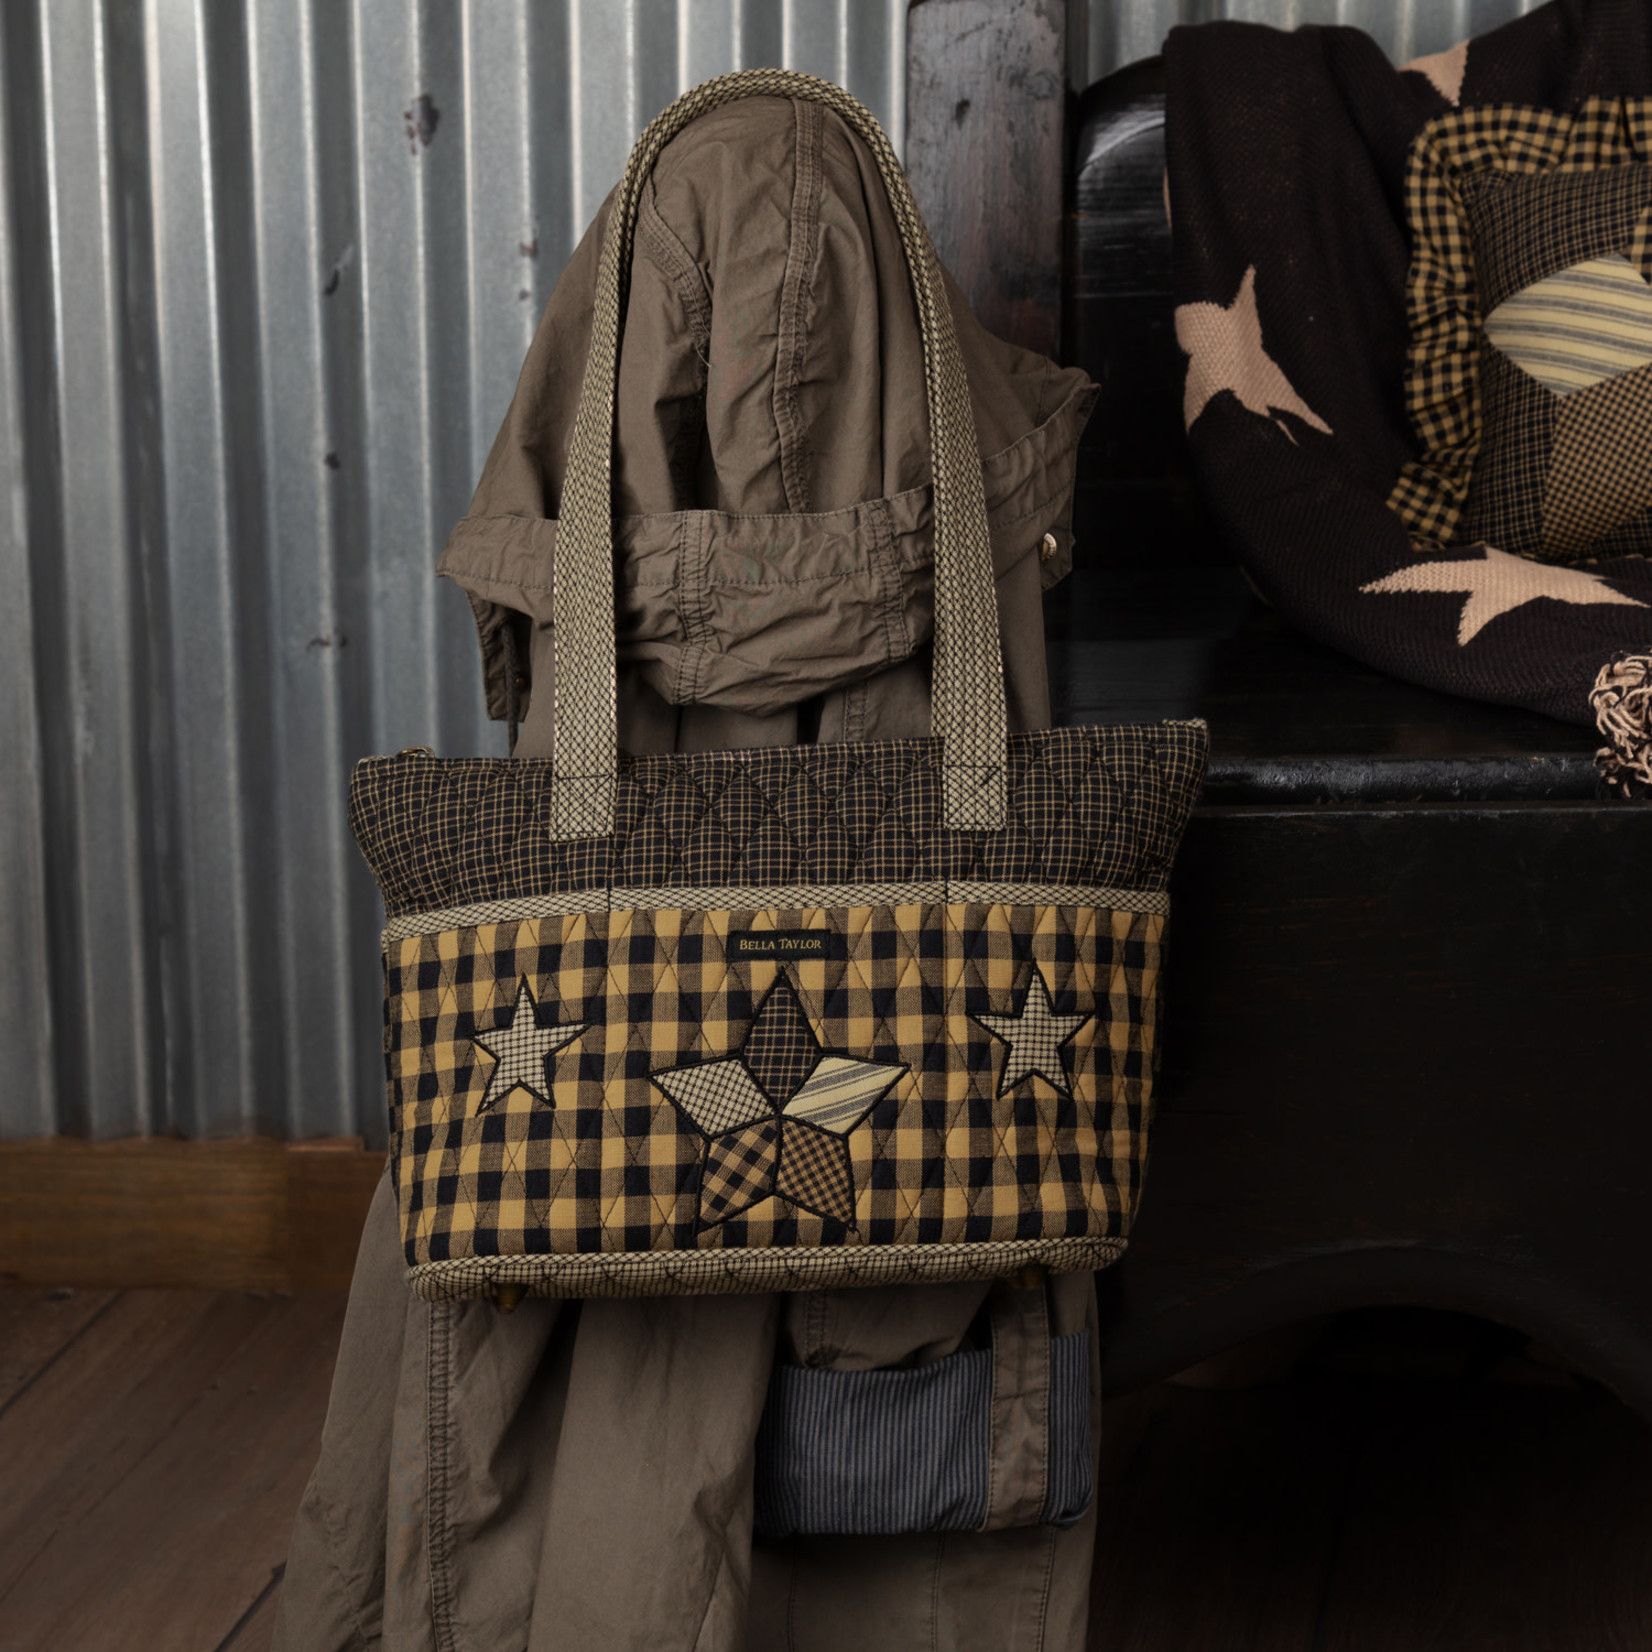 Bella Taylor Farmhouse Star - Taylor handbag